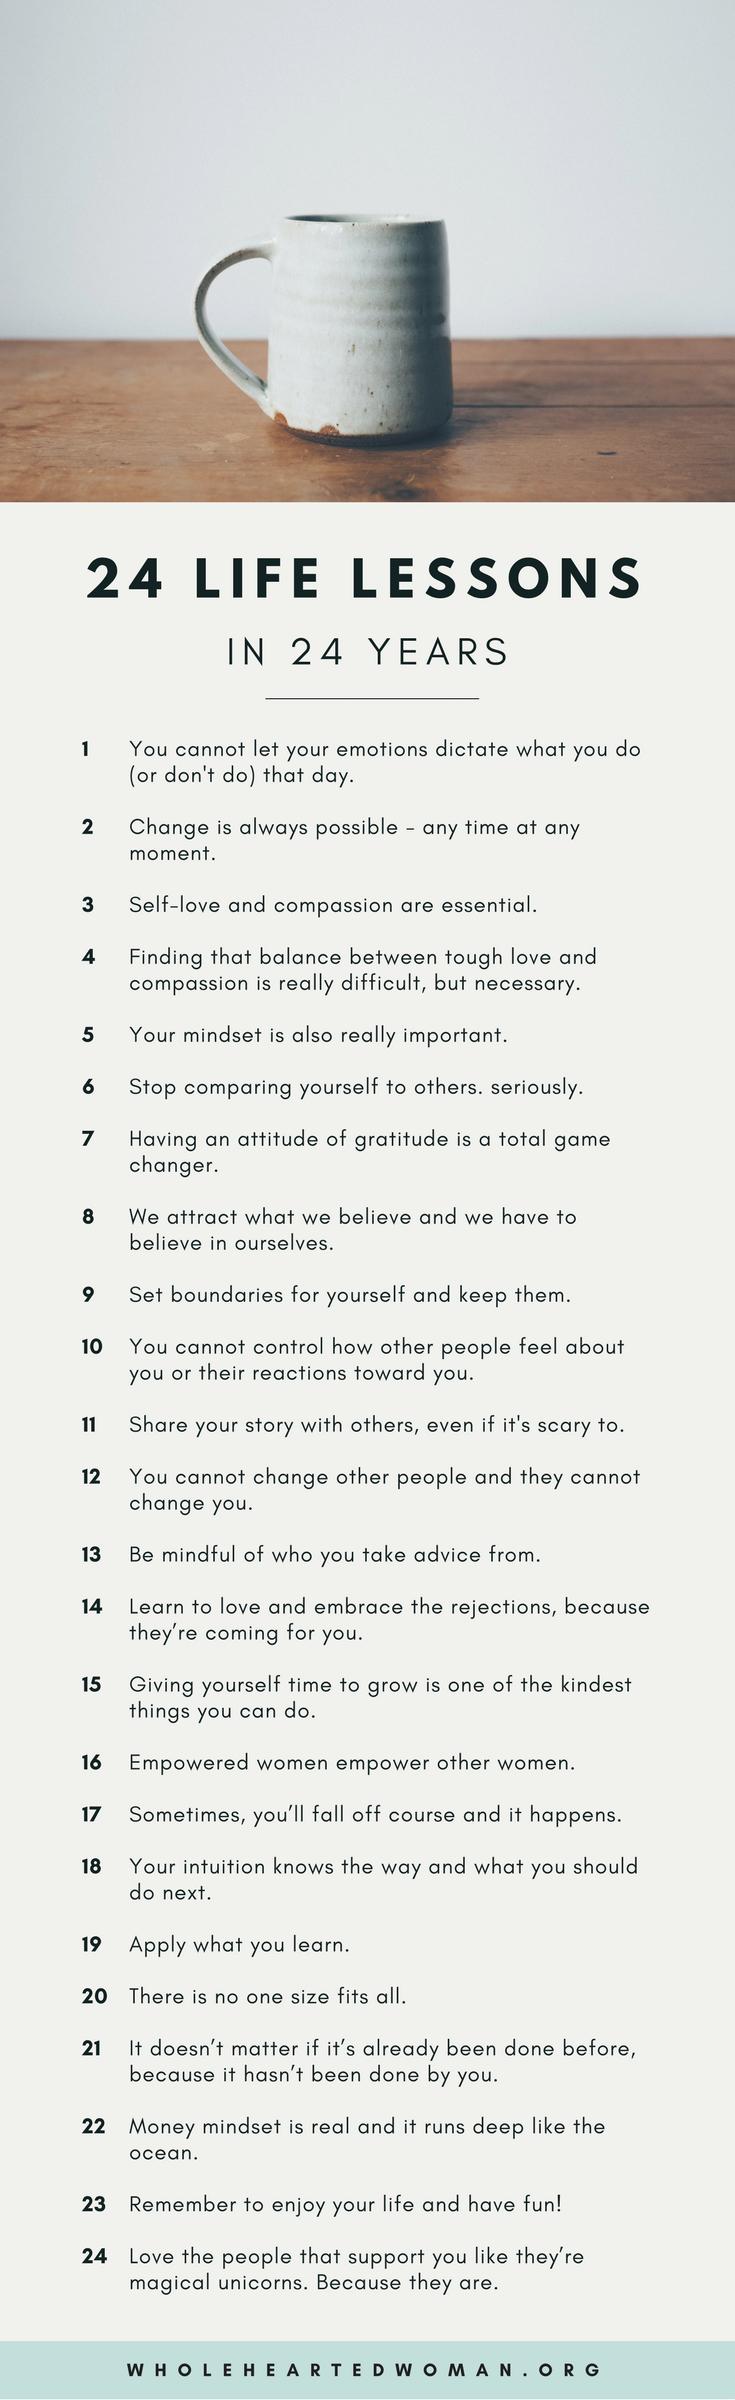 24 Life Lessons In 24 Years 24 Life Lessons in 24 Years | Life Advice | Personal Growth & Development | Mindset